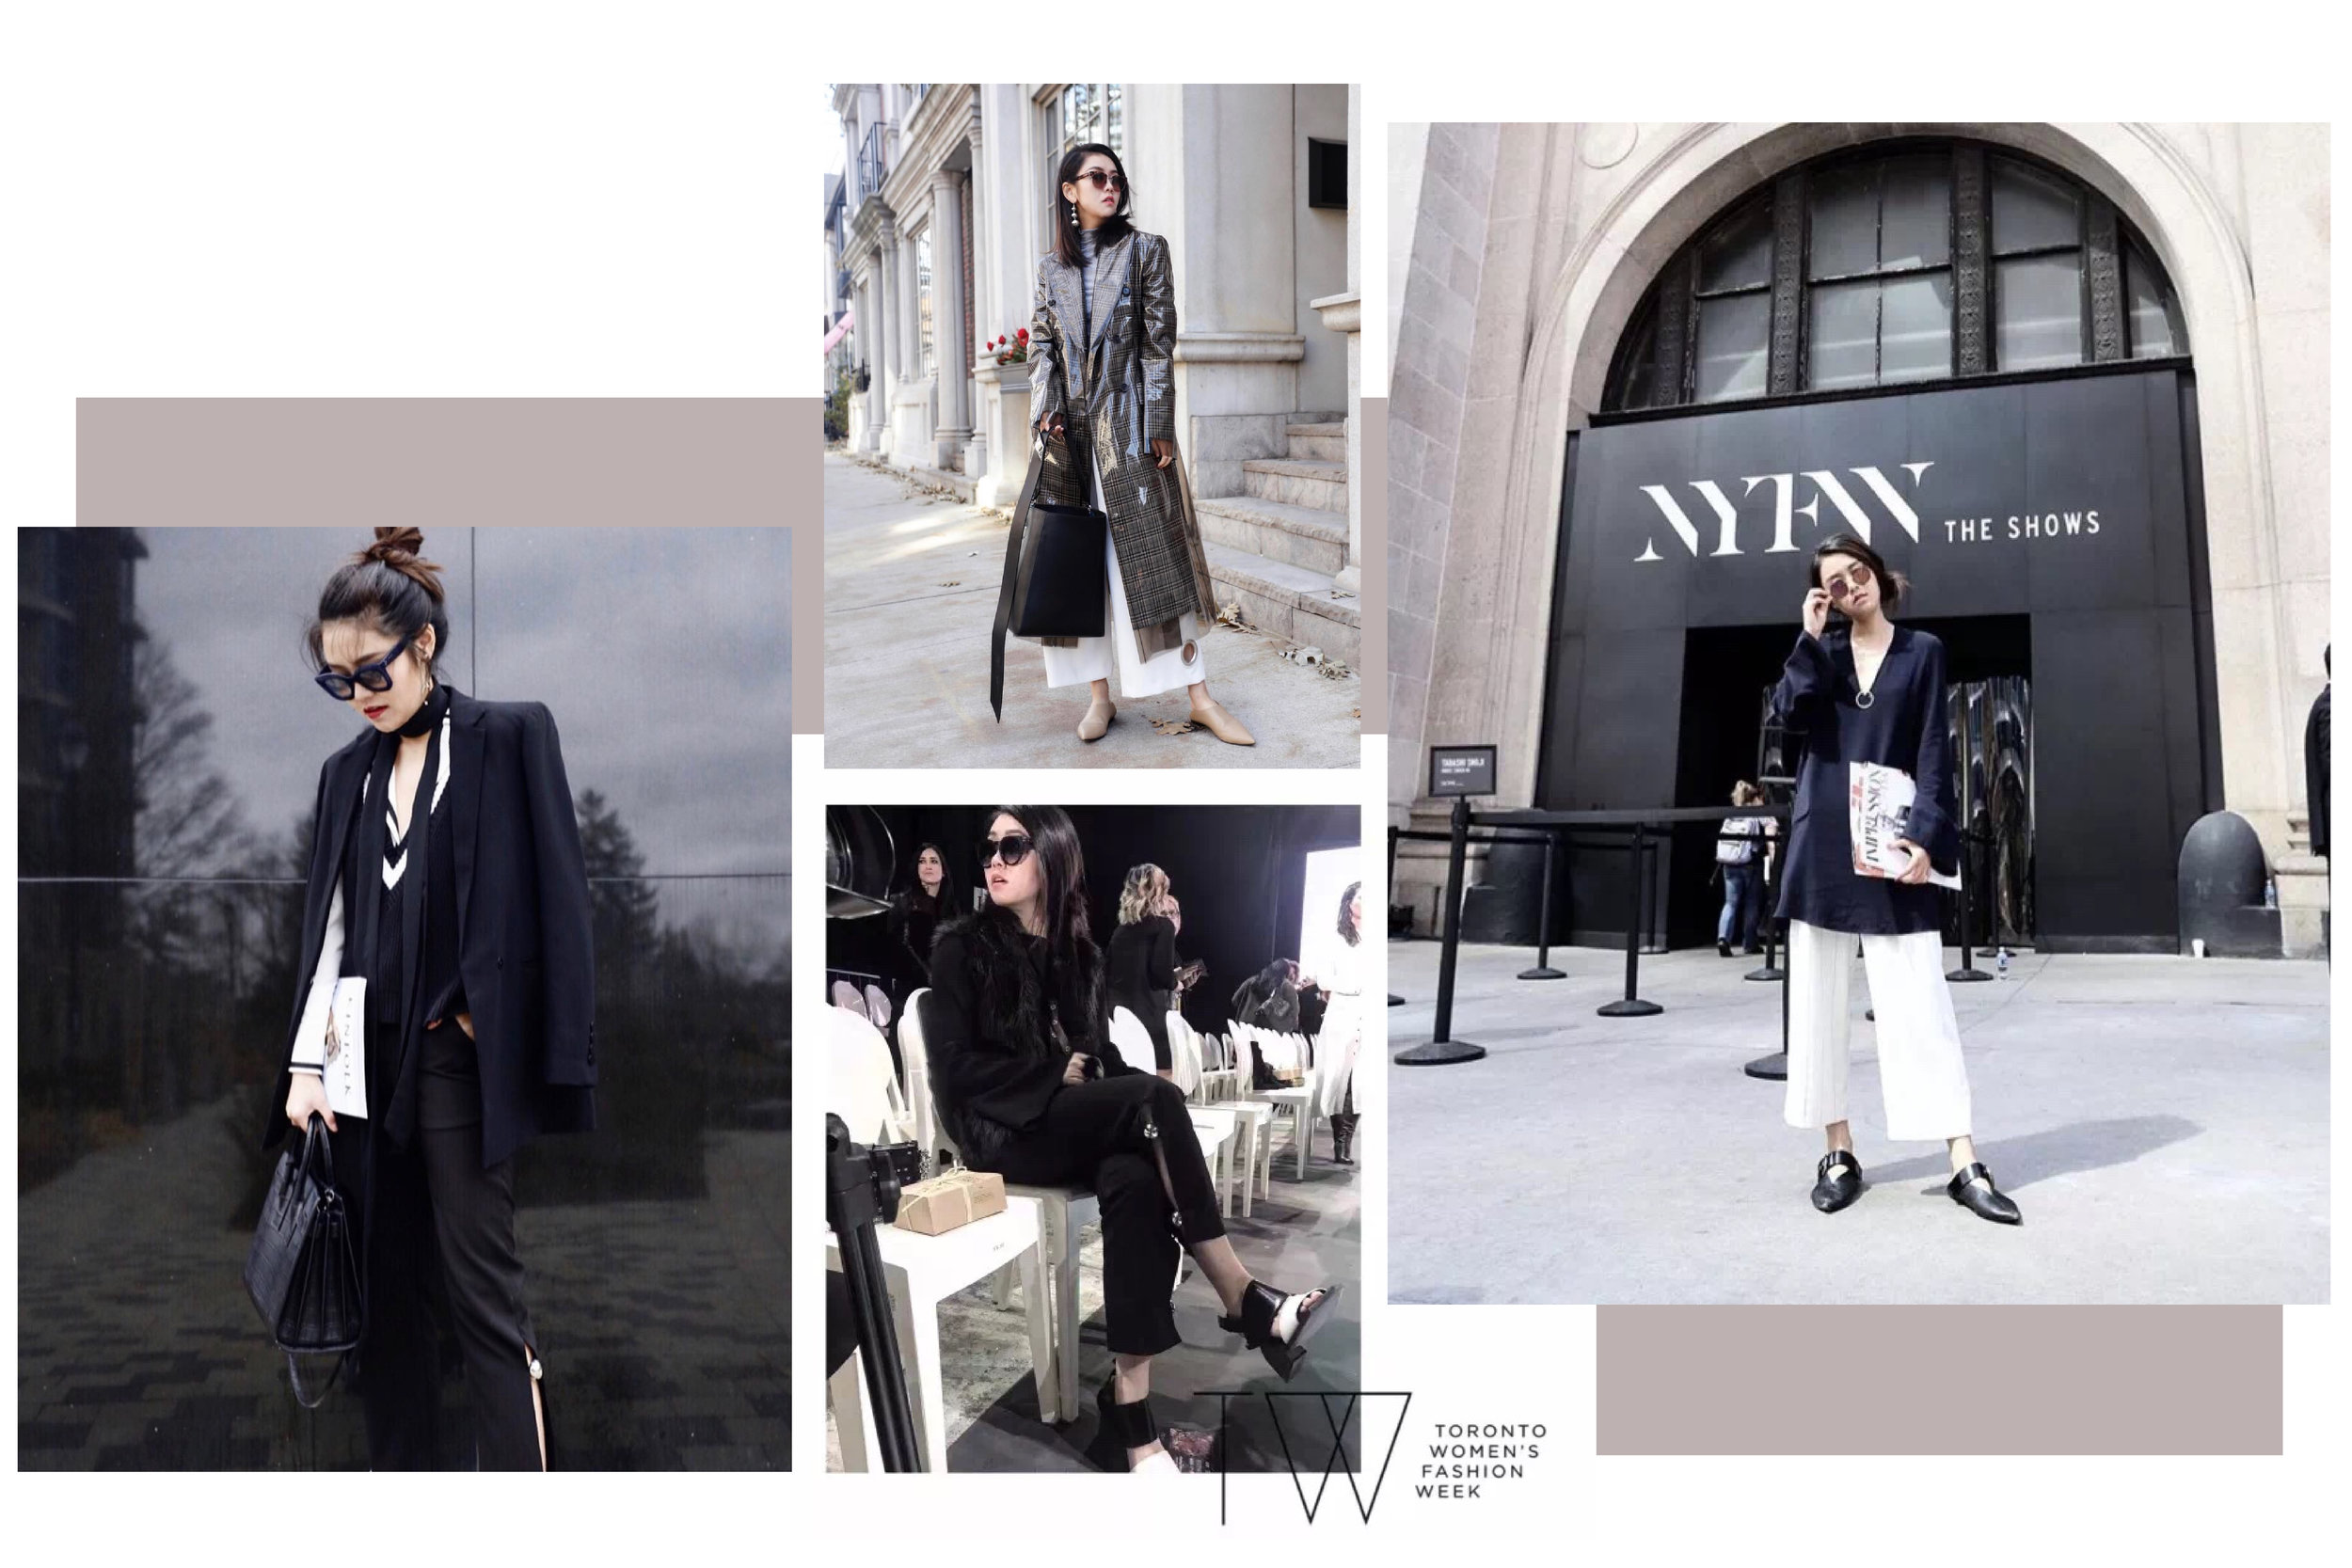 Fashion・influencer - - 如何成為國際時尚部落格? 揭秘時尚工作與生活